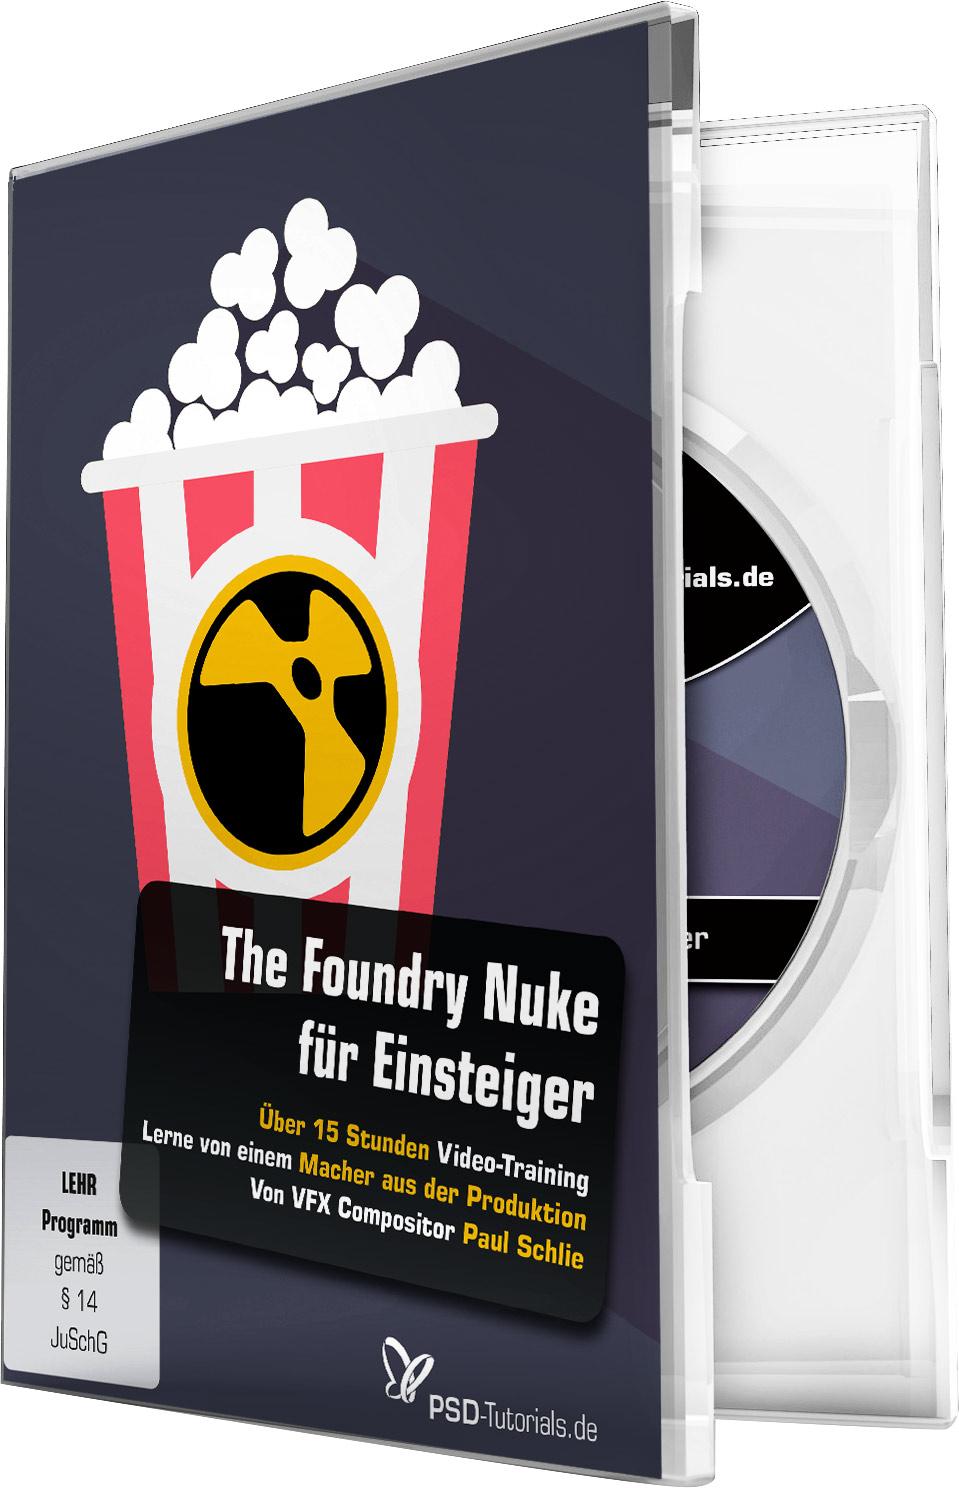 the foundry nuke f r einsteiger psd shop. Black Bedroom Furniture Sets. Home Design Ideas